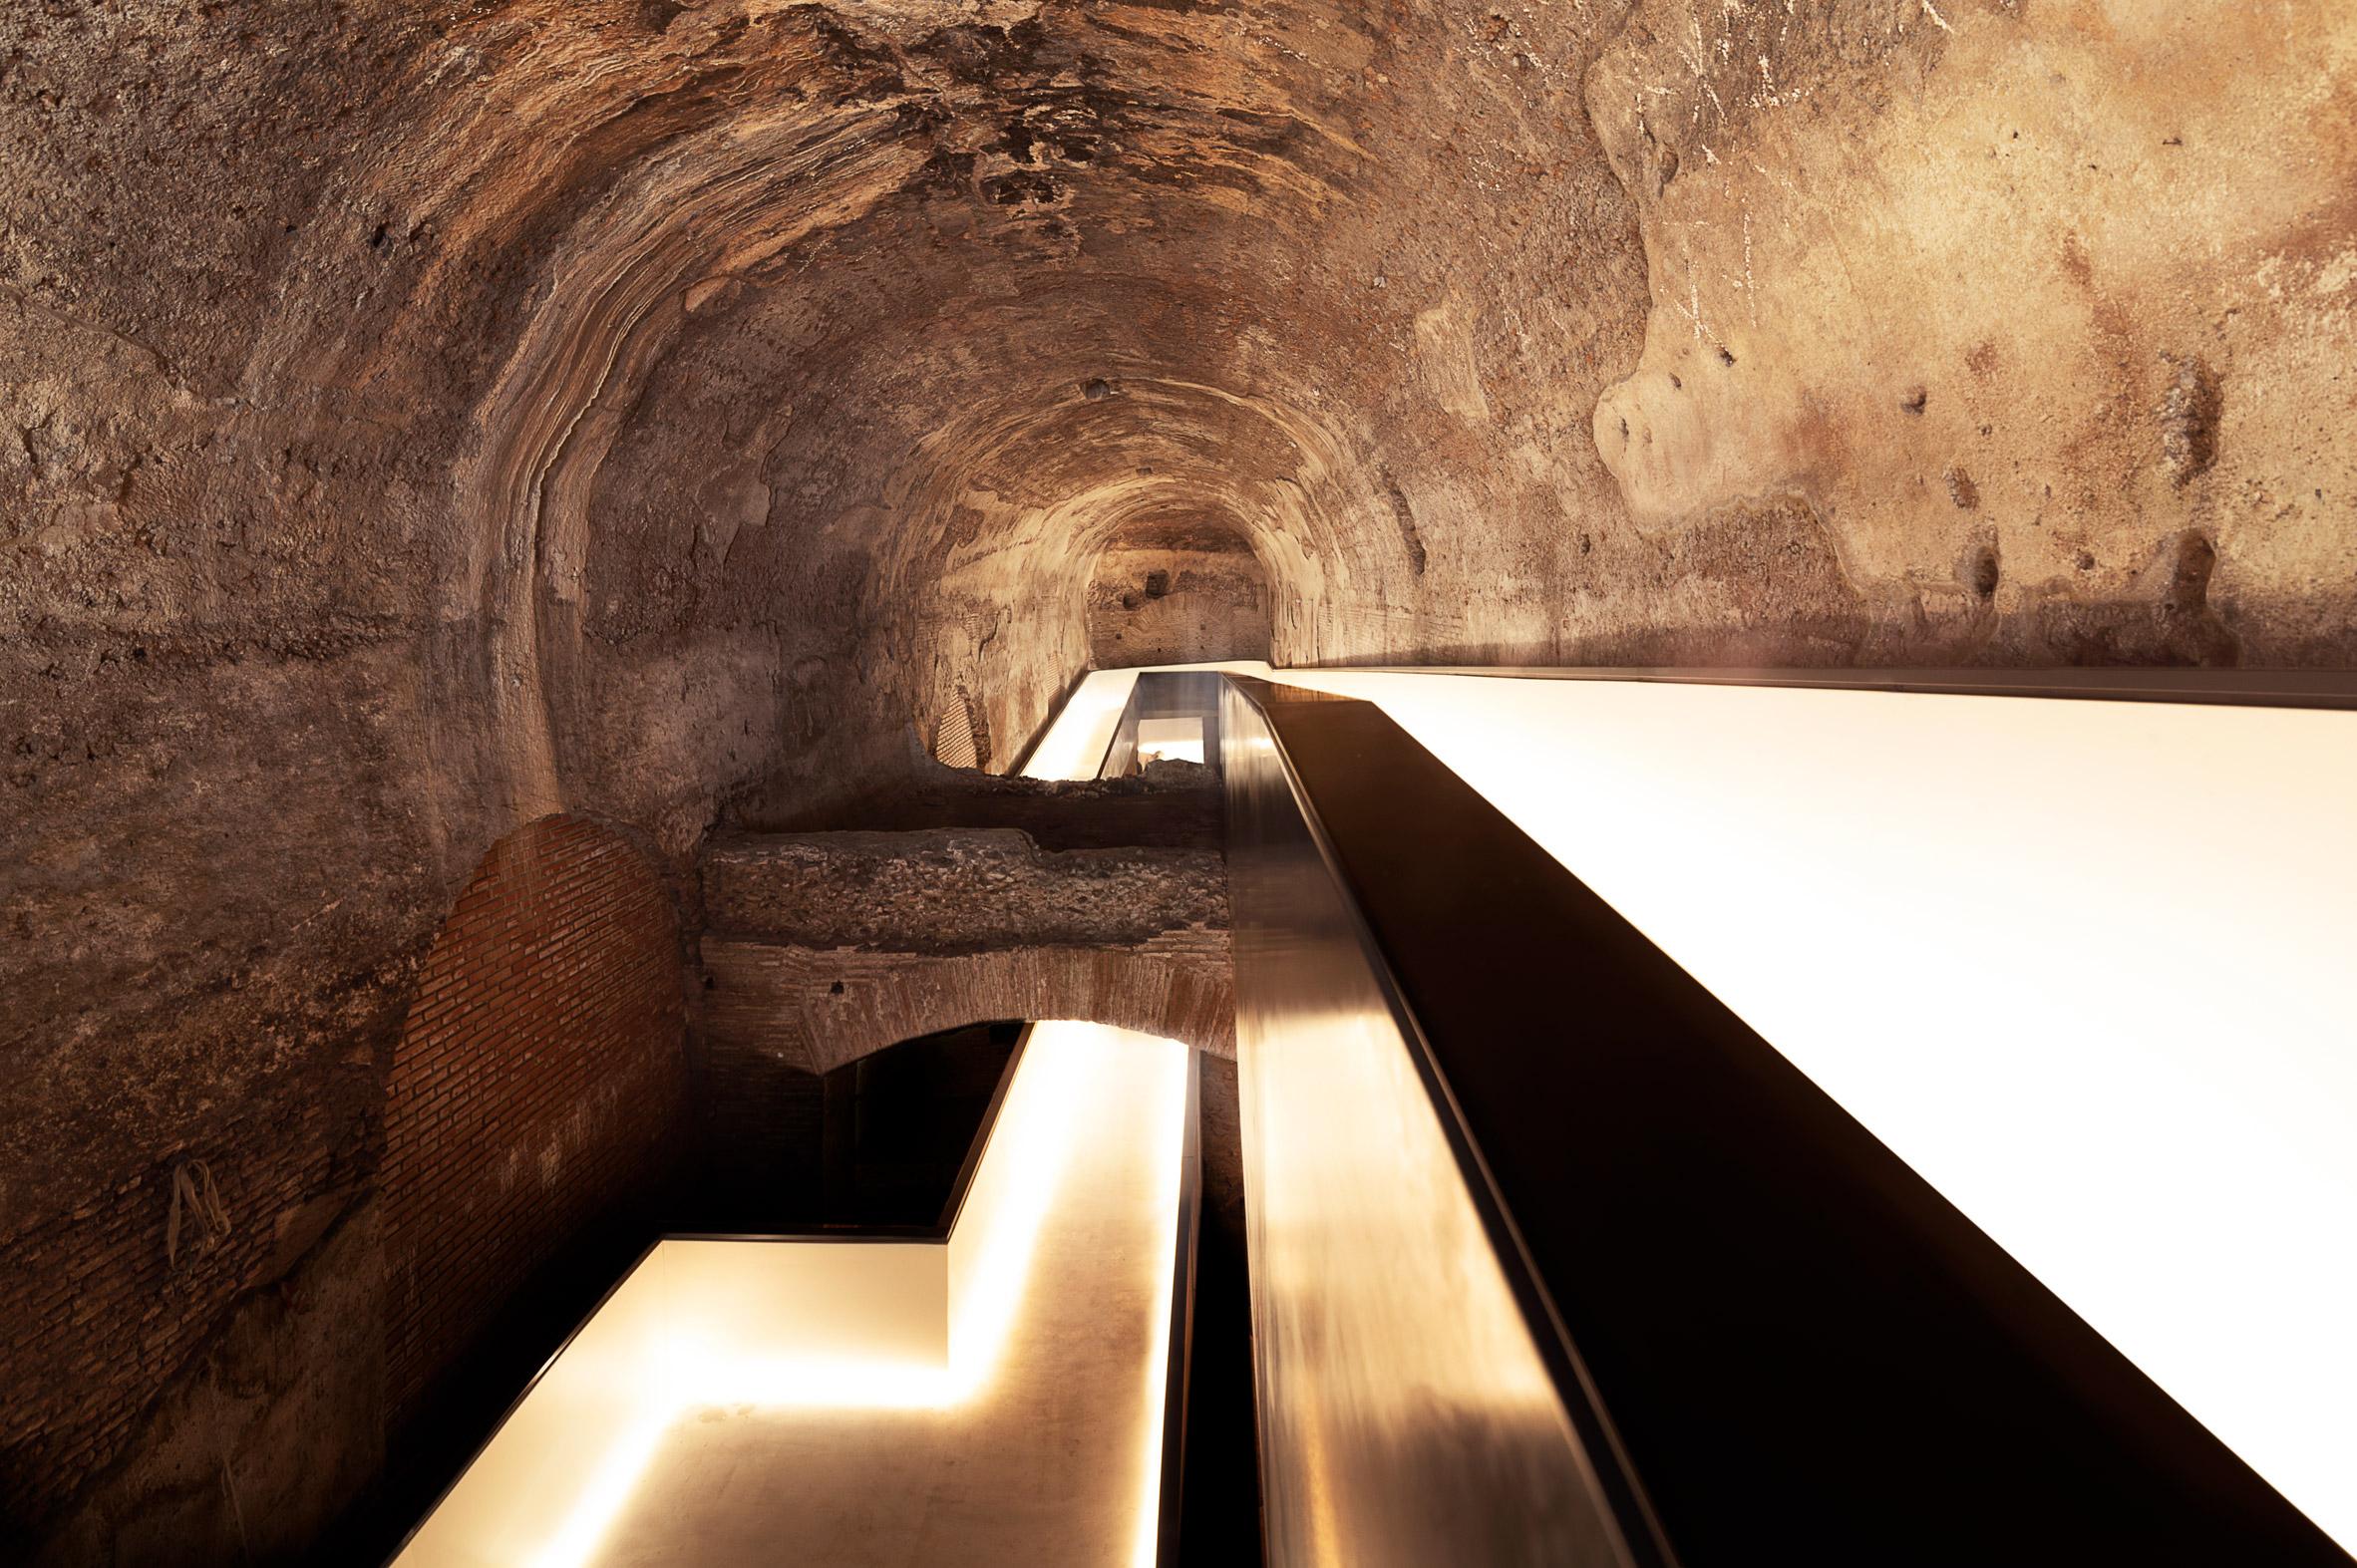 A walkway inside the Domus Aurea ruins